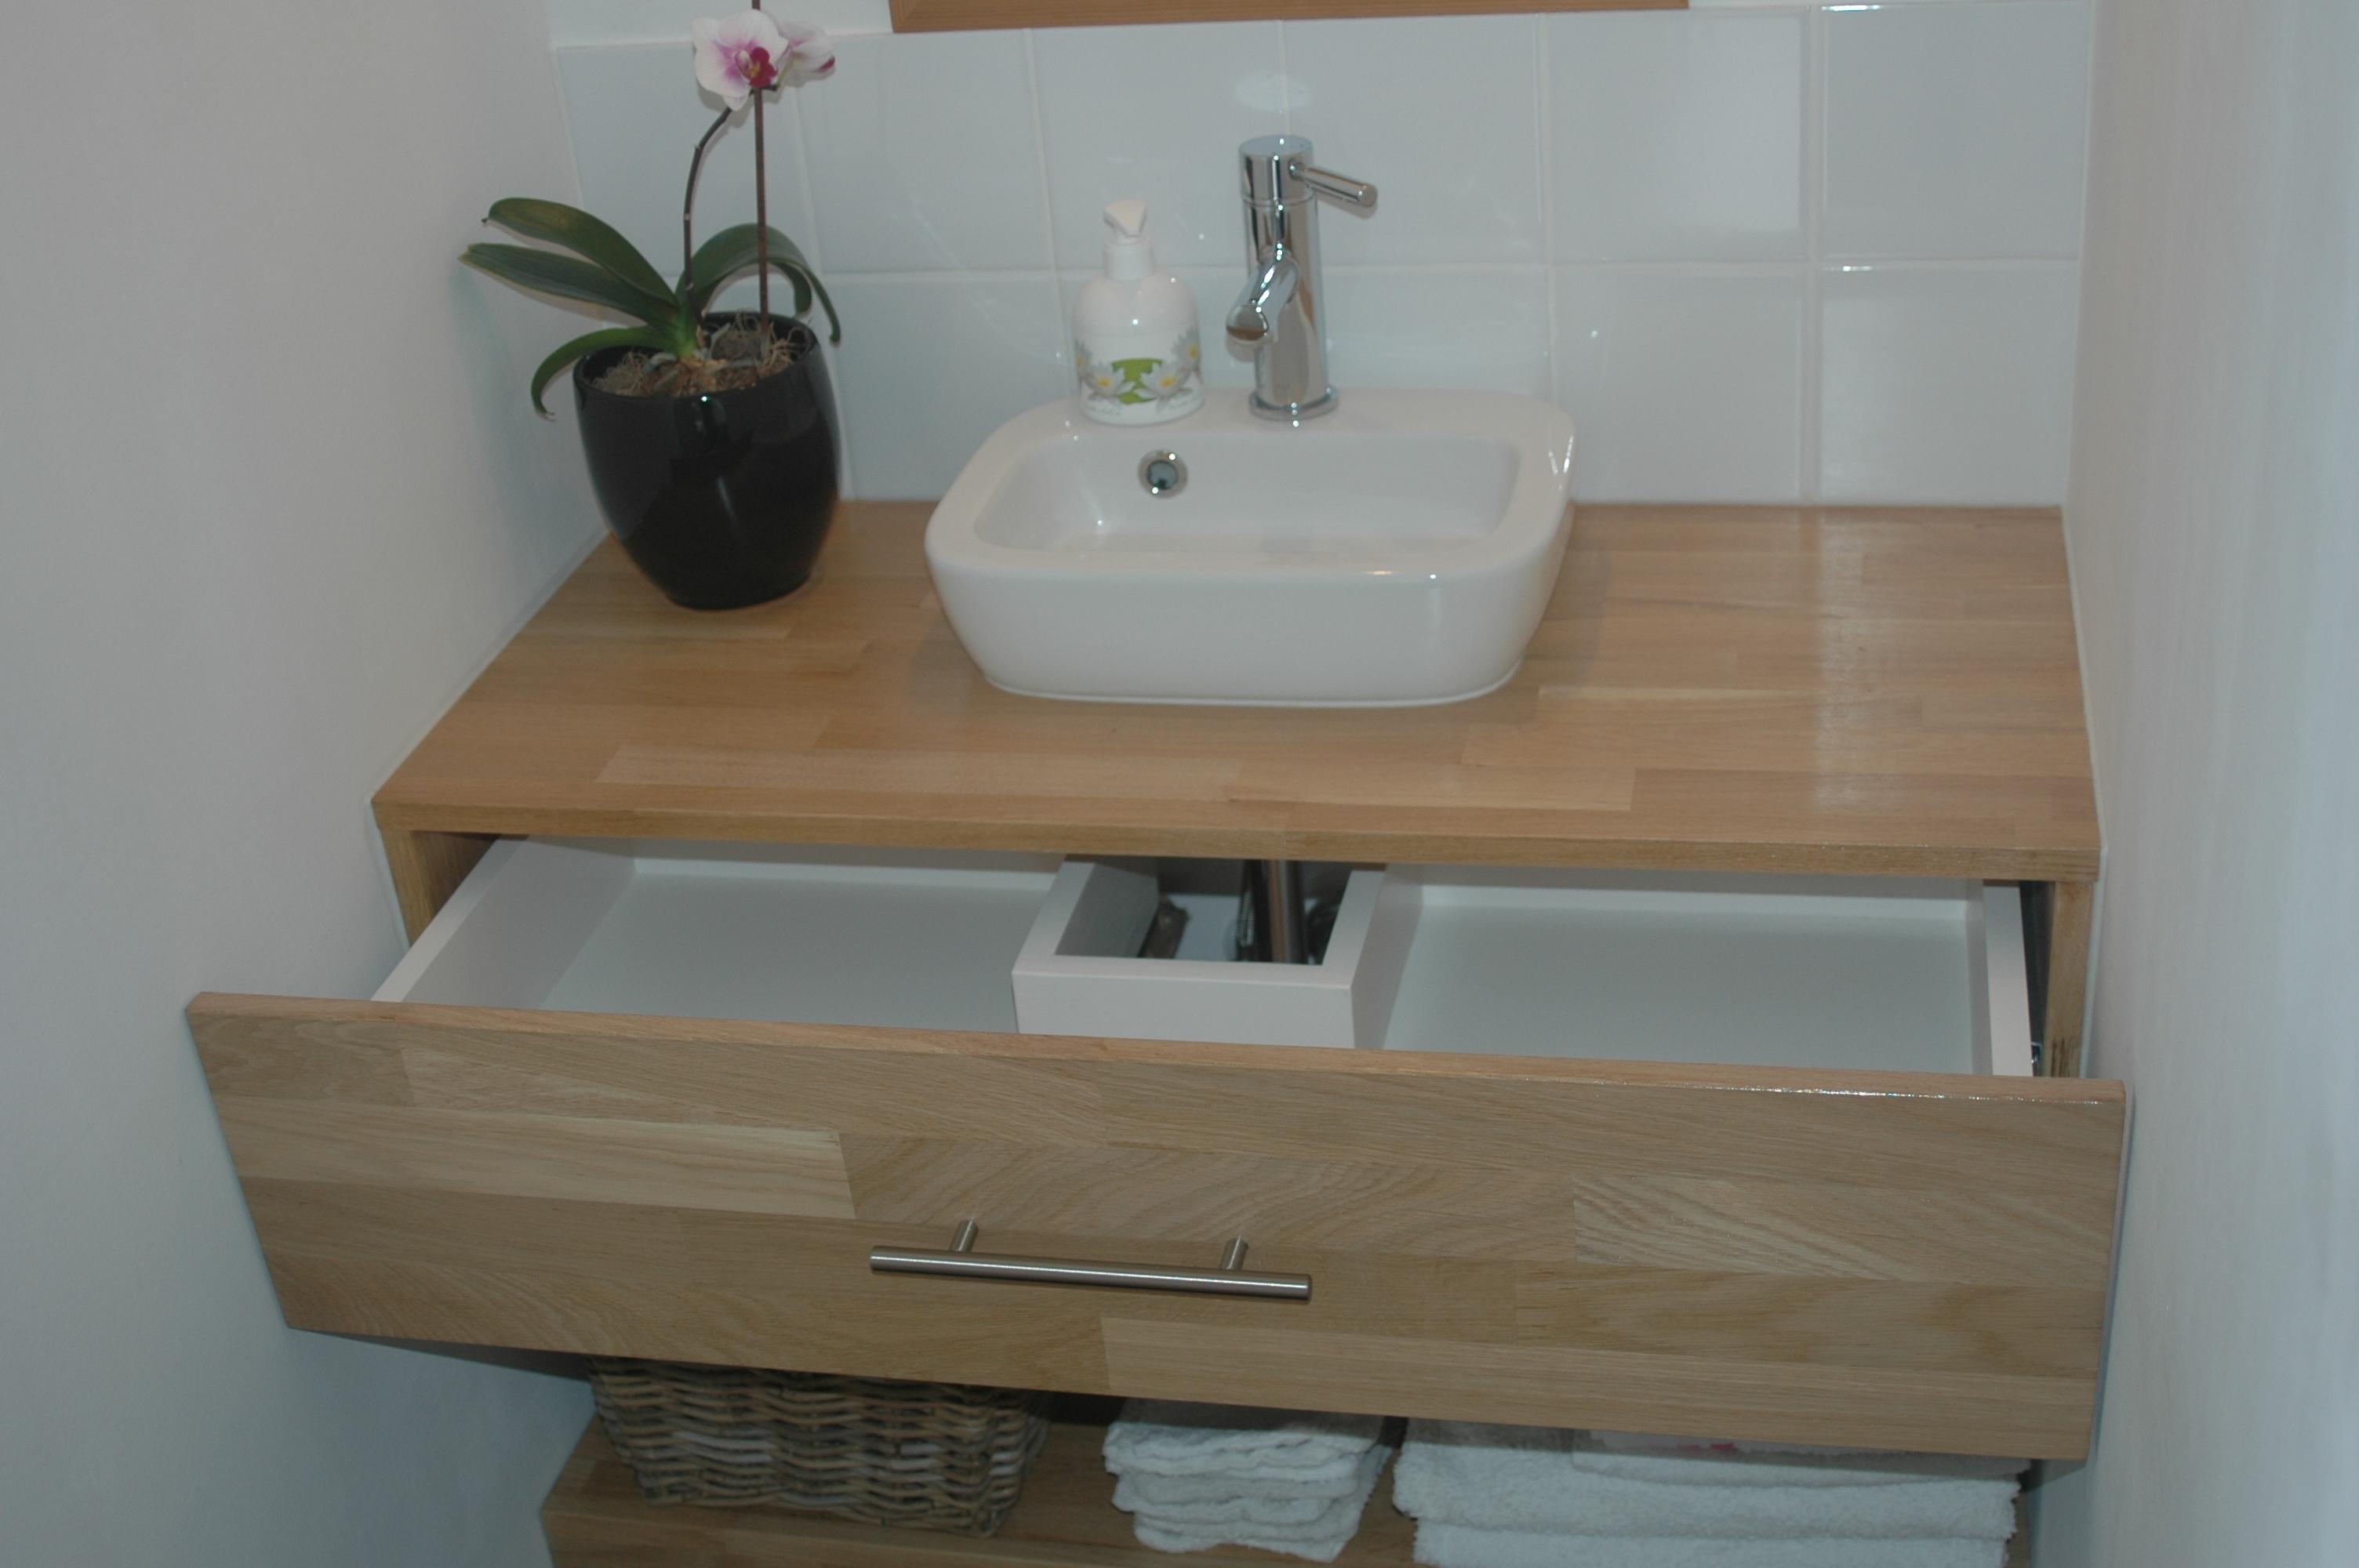 Kastje onder wasbak good houten plank onder wastafel with for Kastje onder wastafel toilet